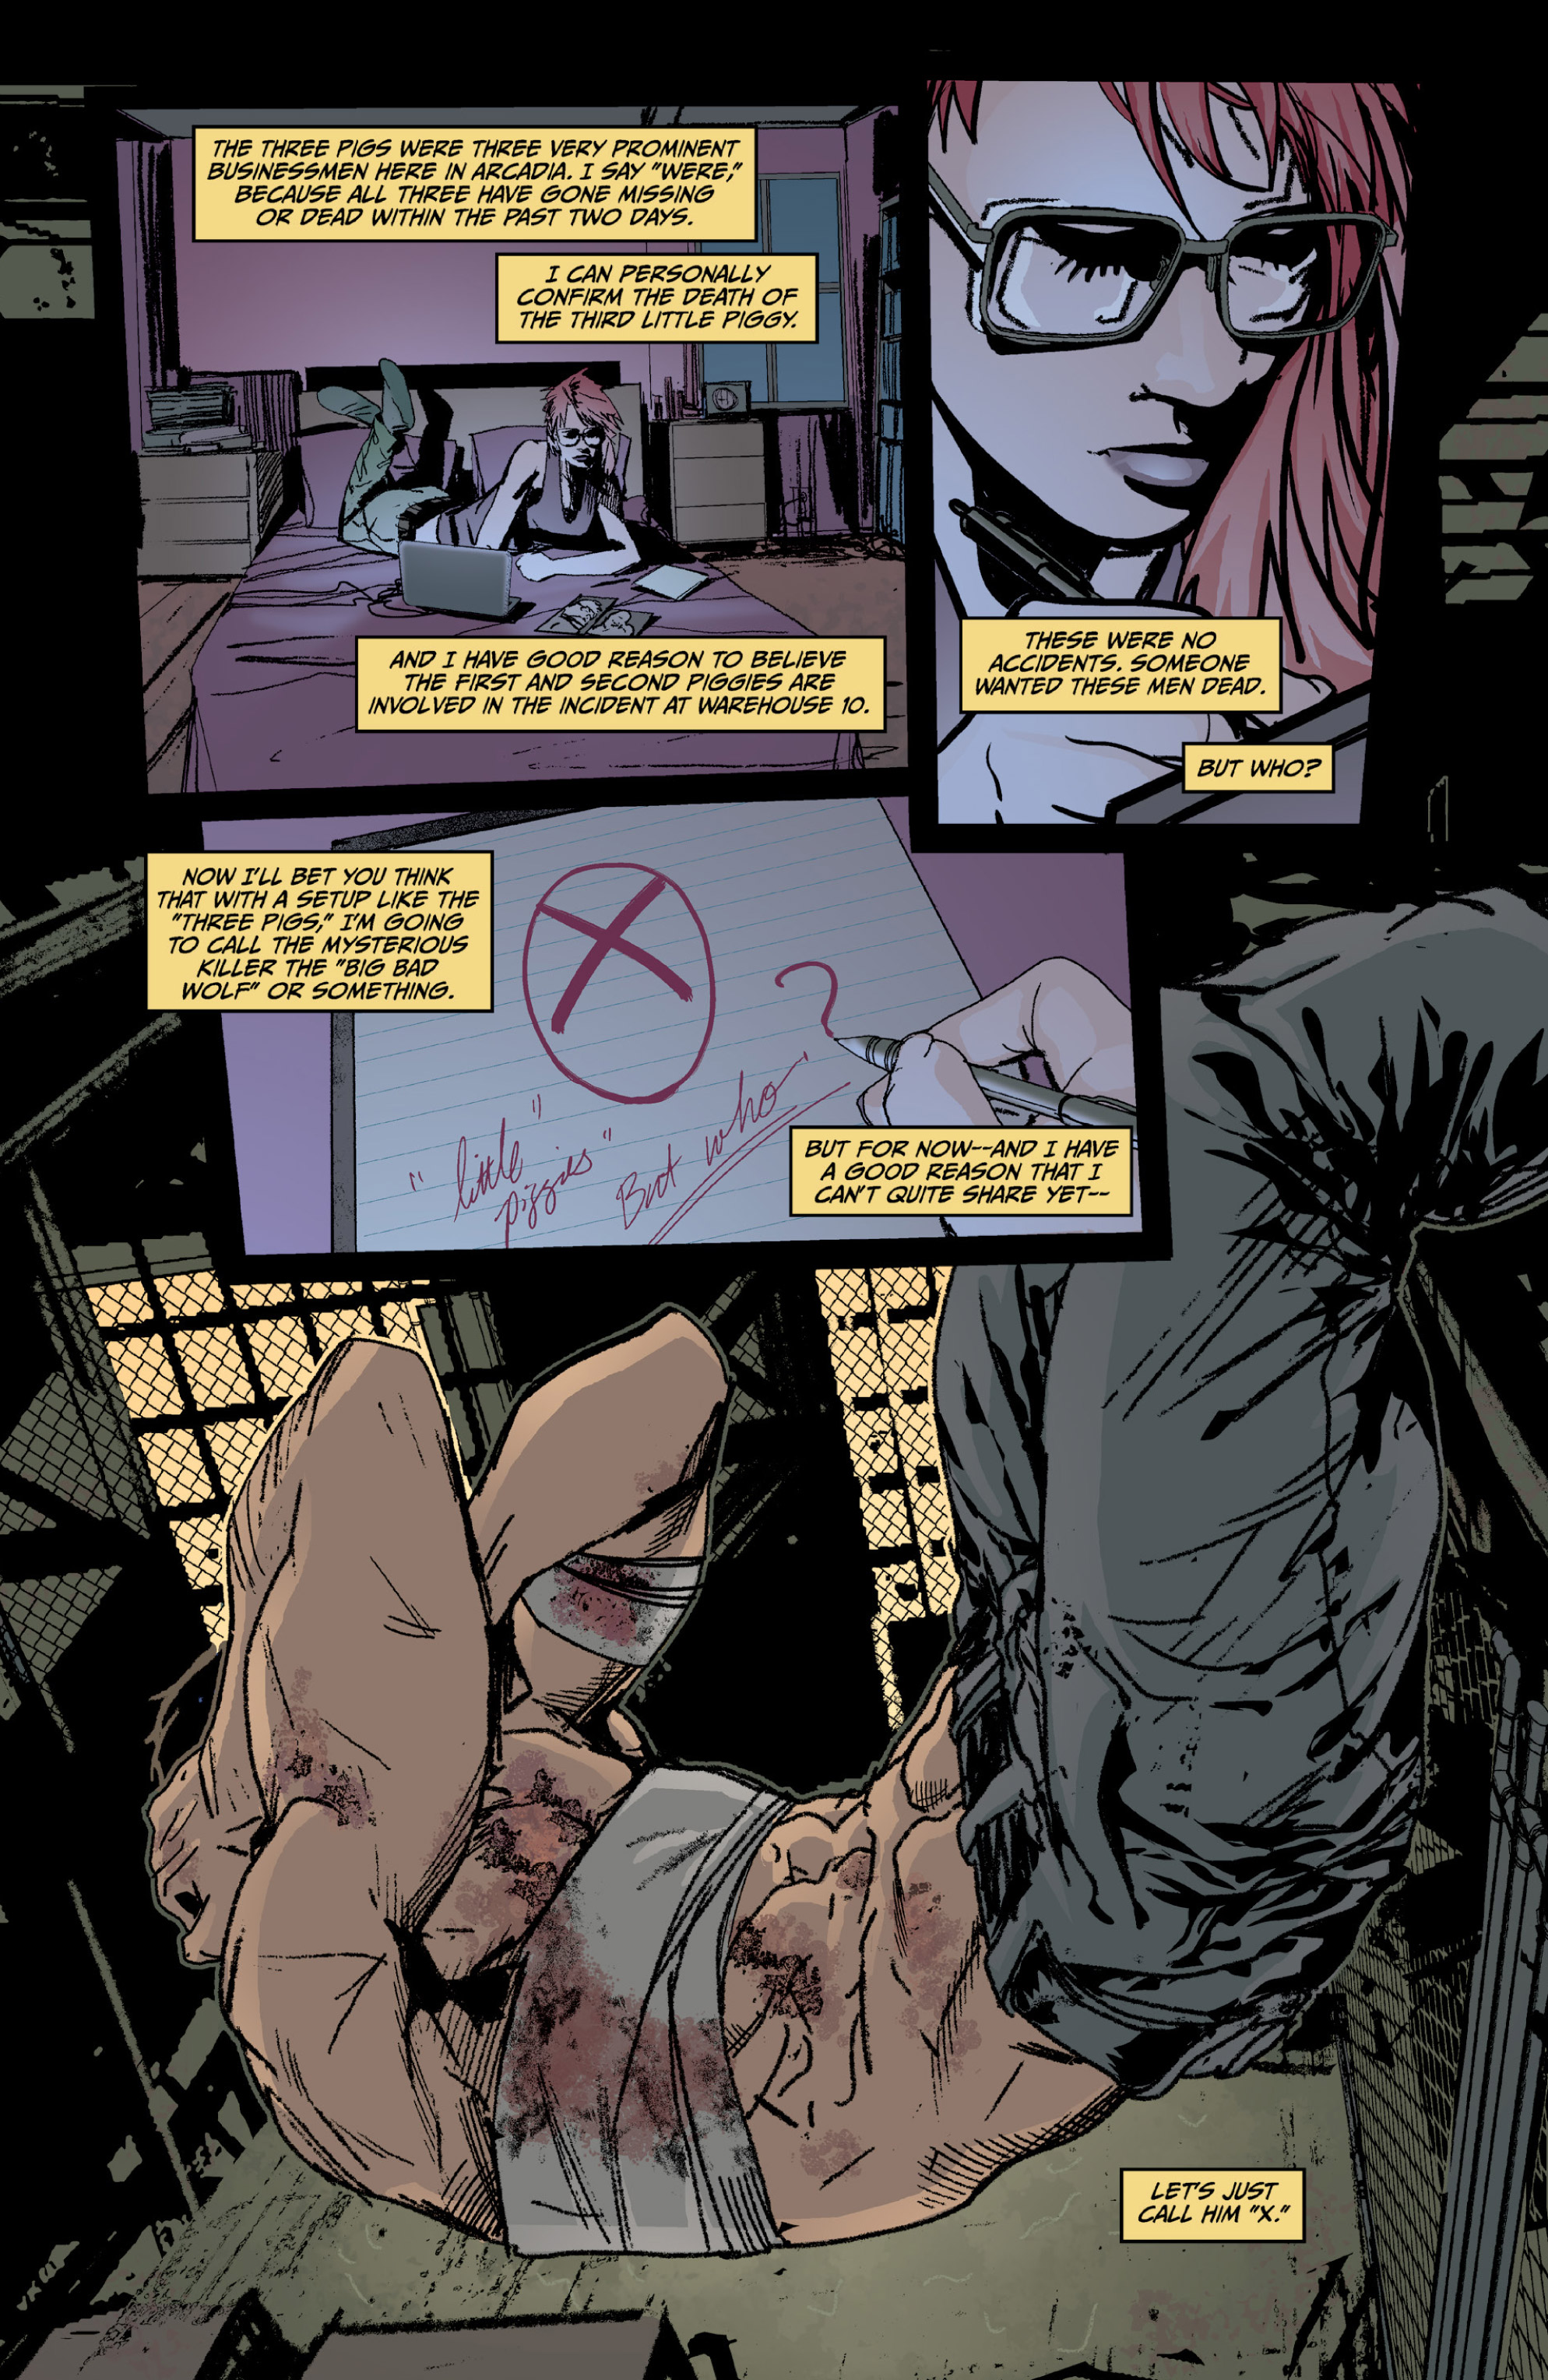 Read online X: Big Bad comic -  Issue # Full - 44